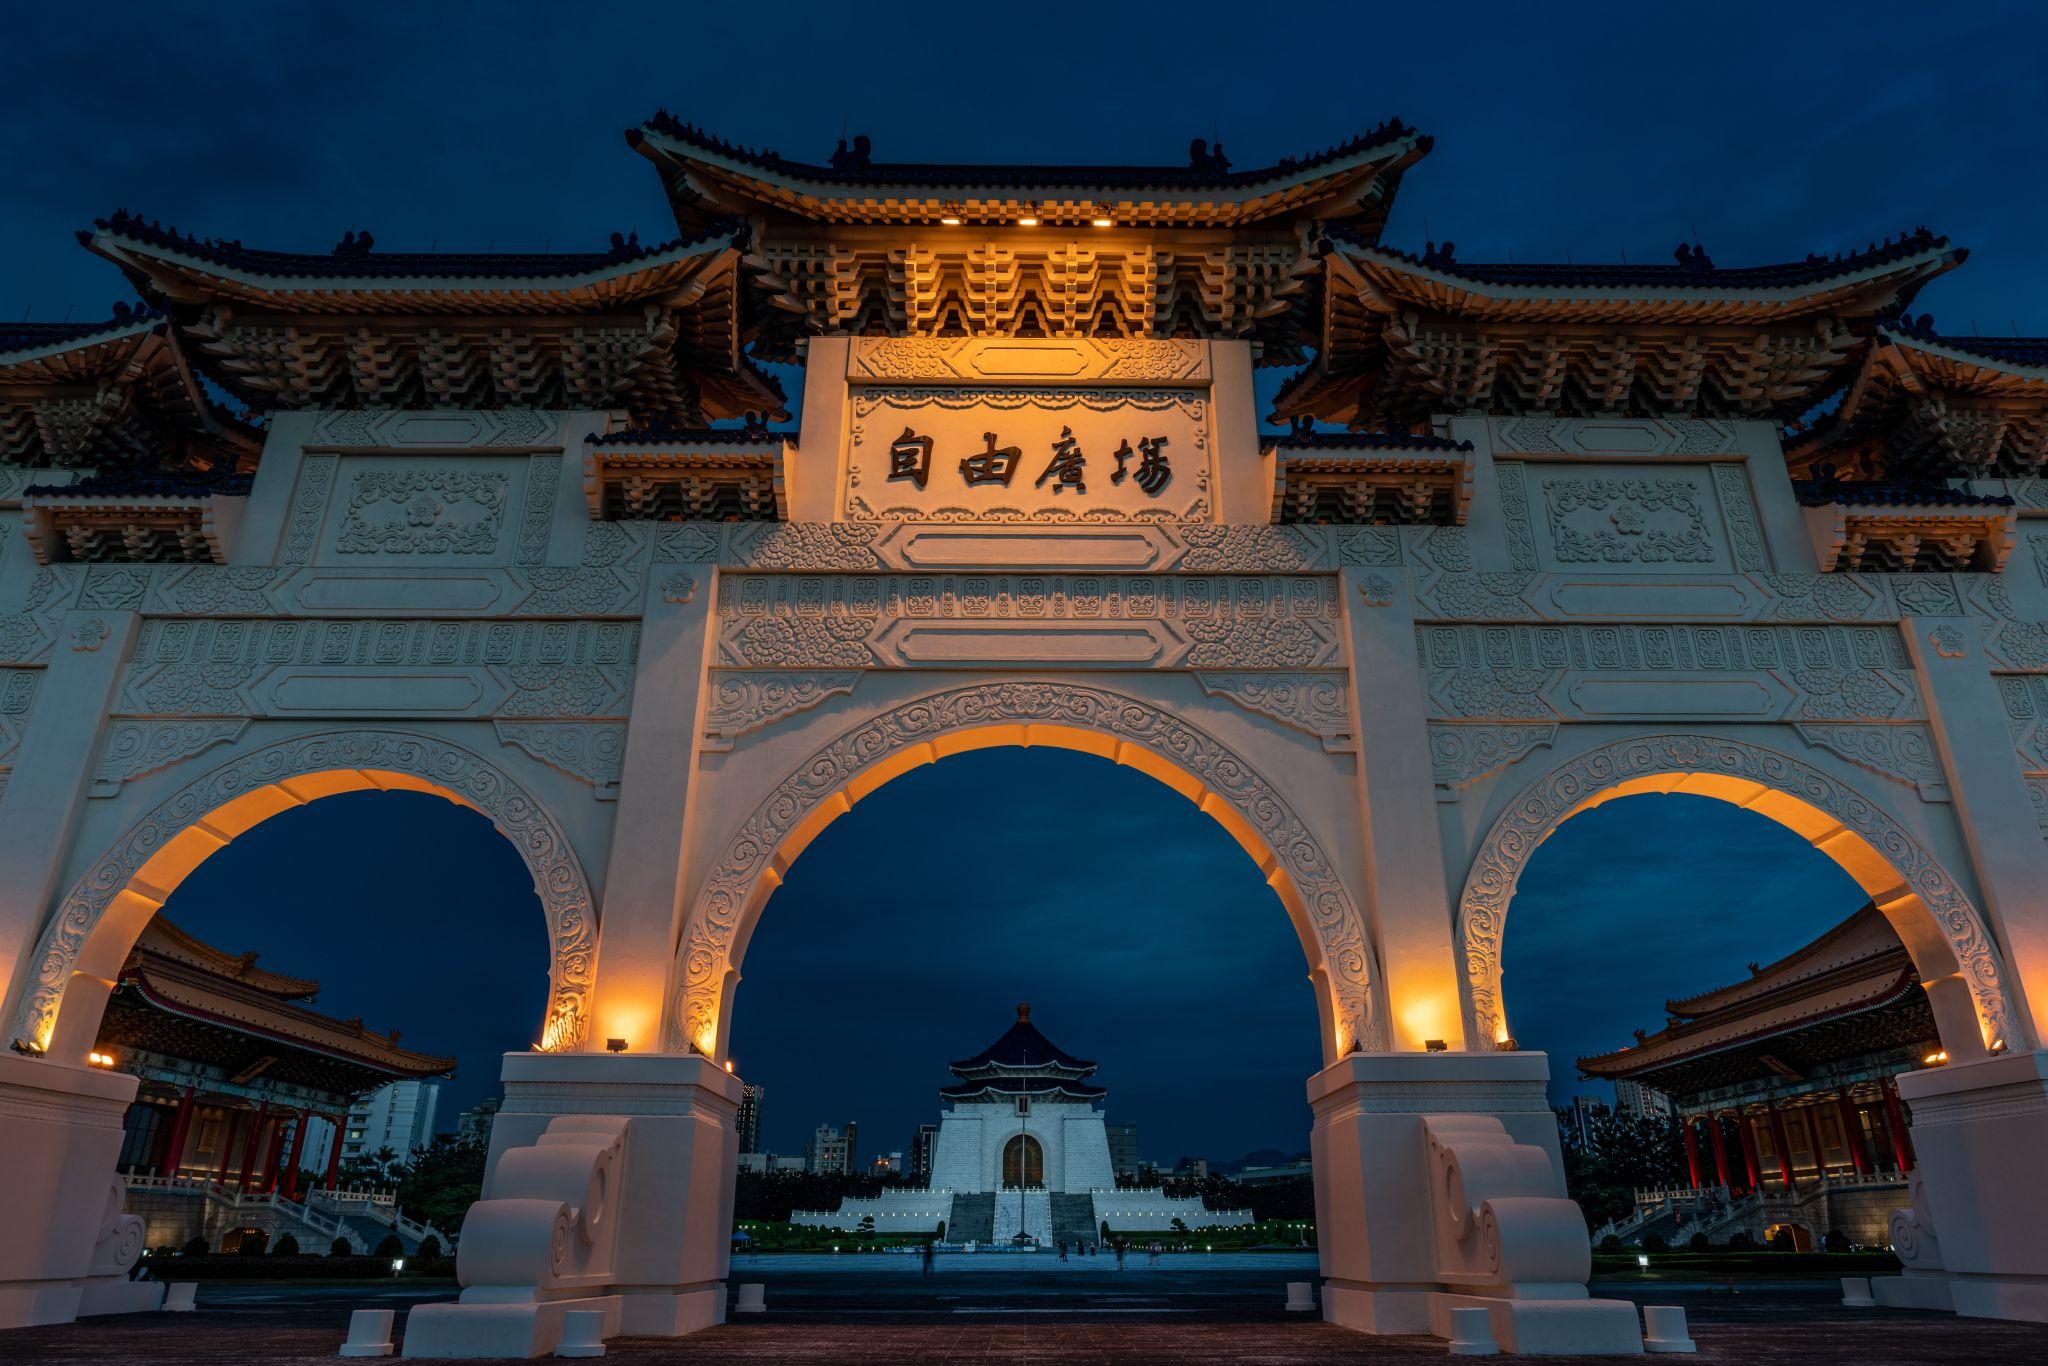 Liberty Square Arch, Taipei, Taiwan